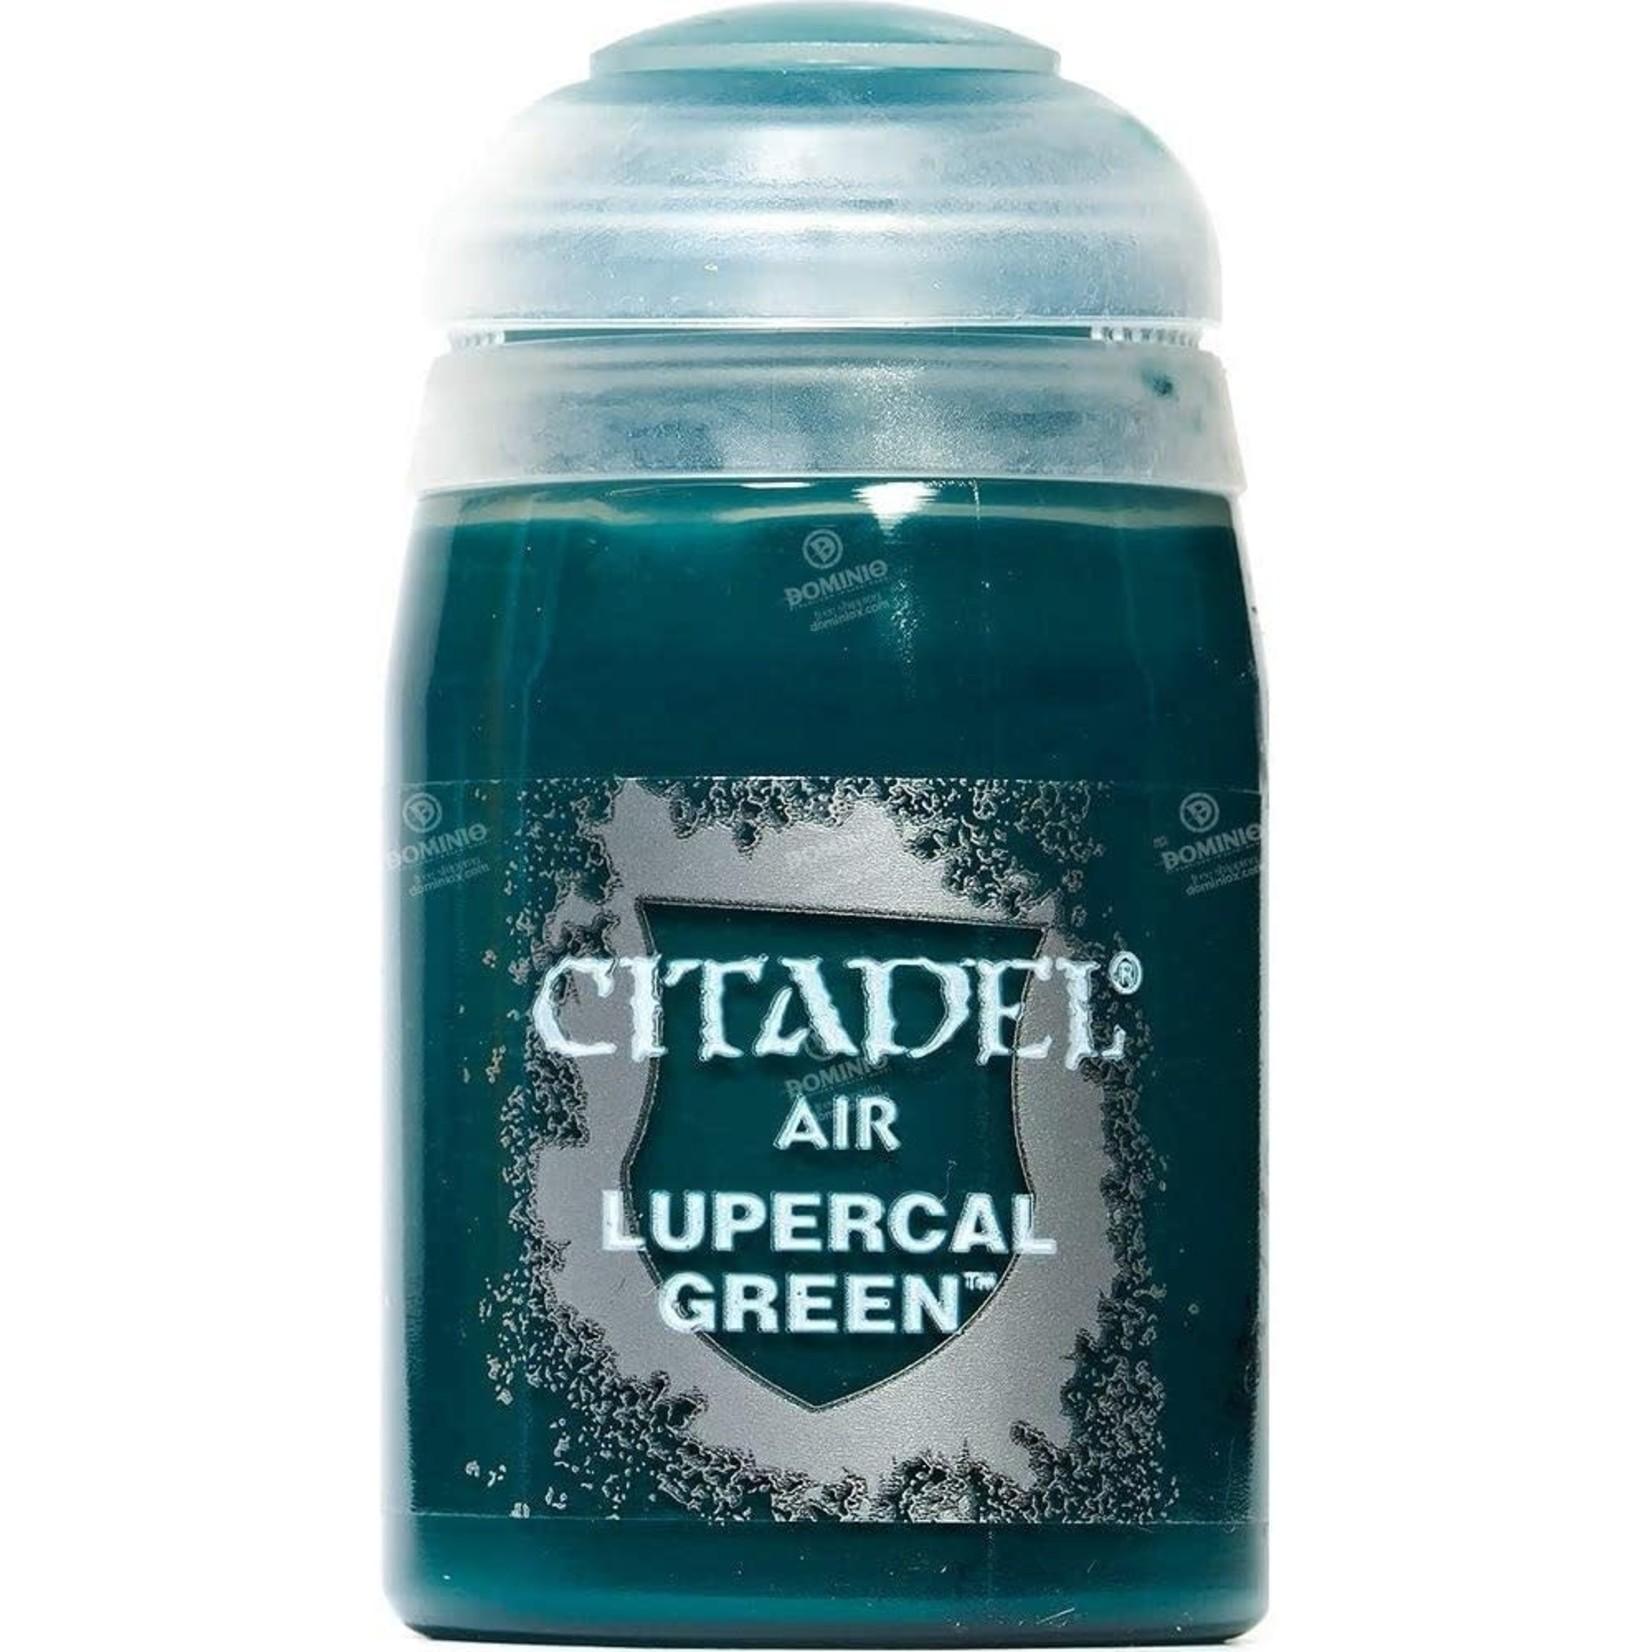 Games Workshop Citadel Paint: Lupercal Green Air (24 ml)